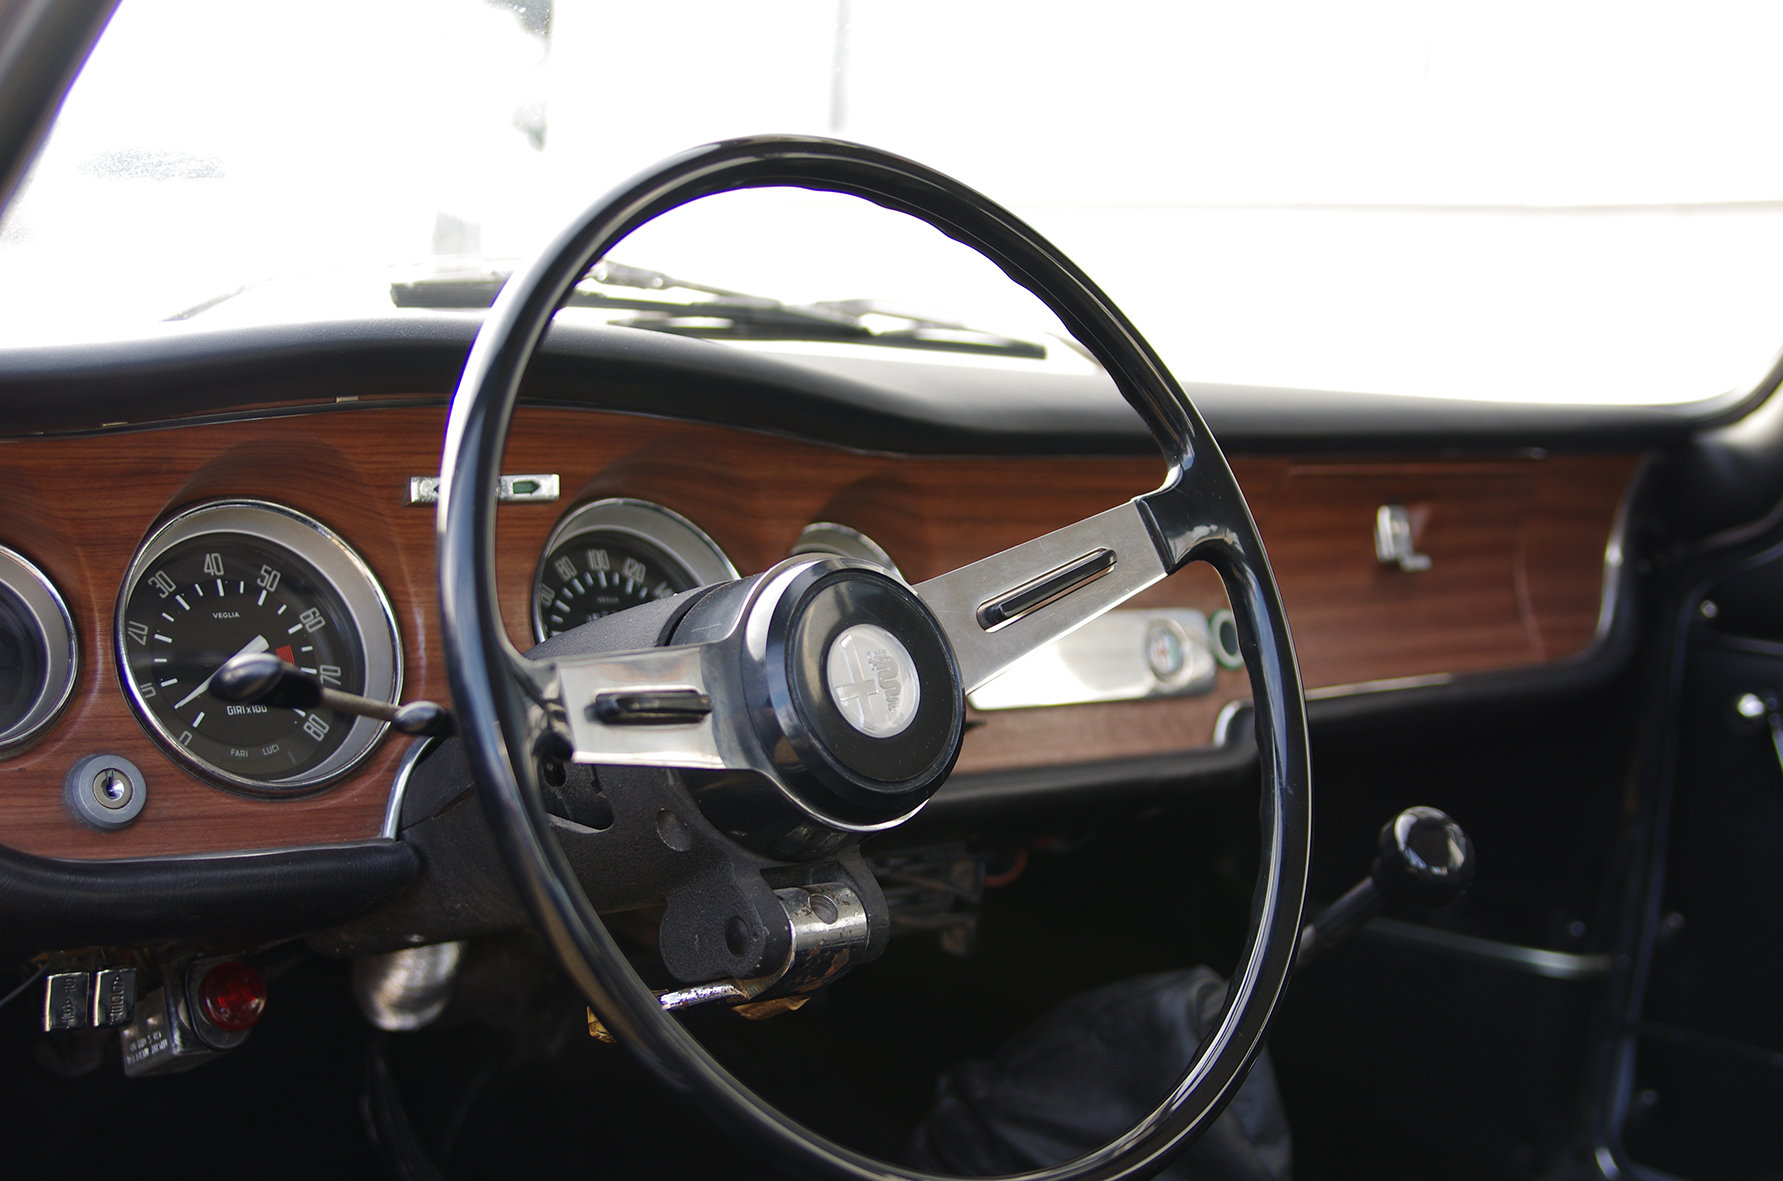 1967 Alfa Romeo Giulia GT 1300 Junior *restored* UK delivery poss SOLD (picture 3 of 6)